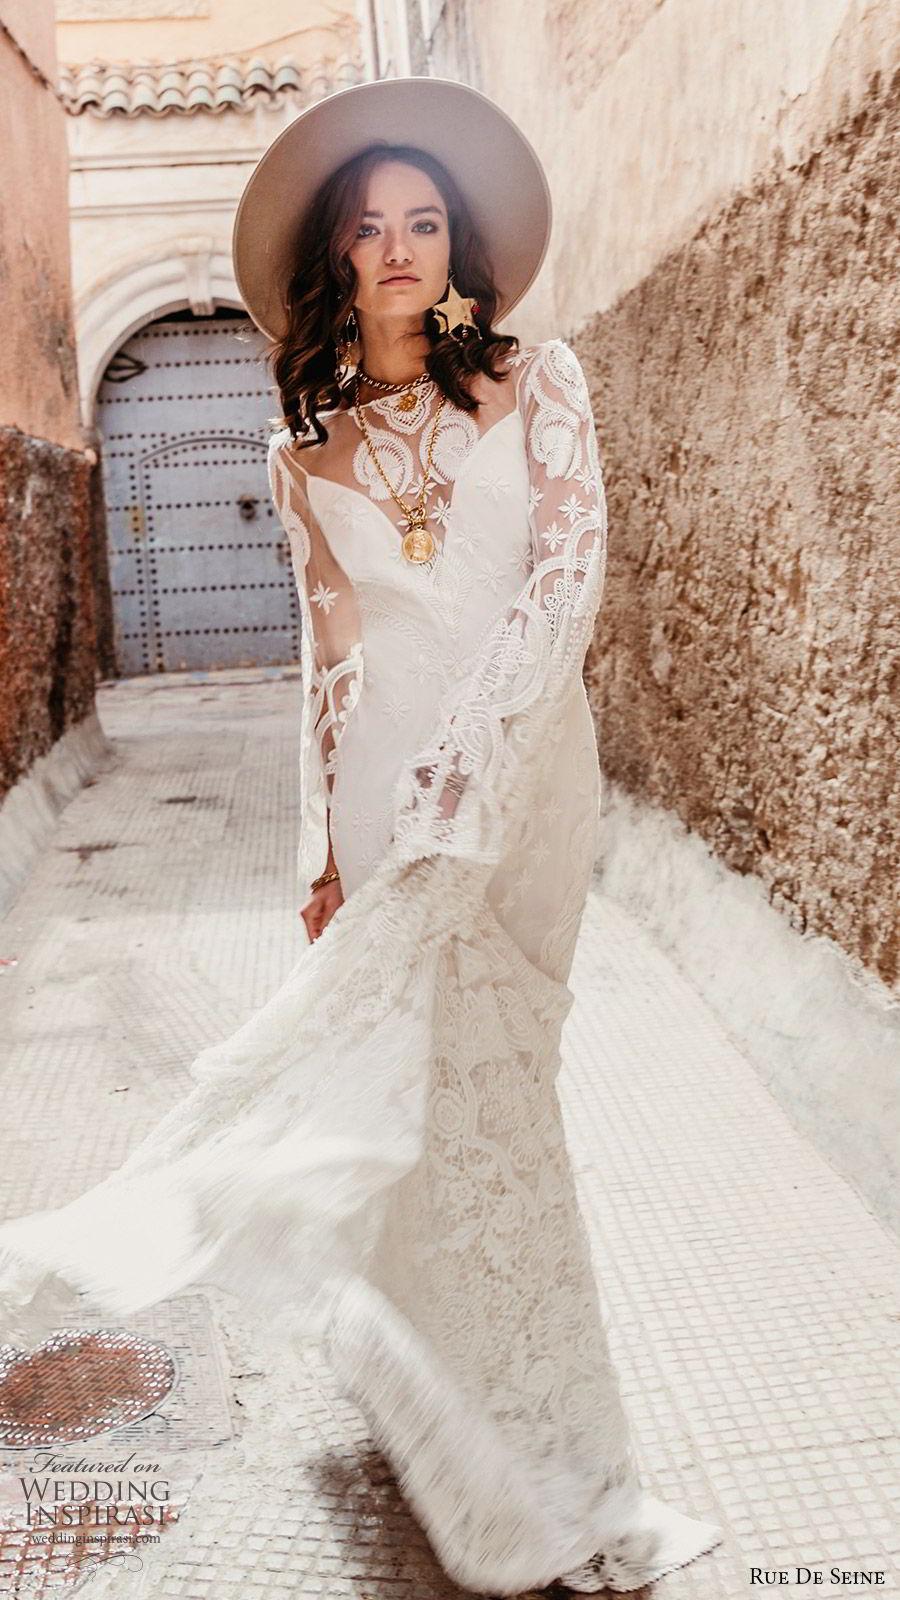 rue de seine 2019 bridal sheer long sleeves illusion bateau neckline sweetheart trumpet sheath lace wedding dress (17) boho chic open back romantic chapel train mv